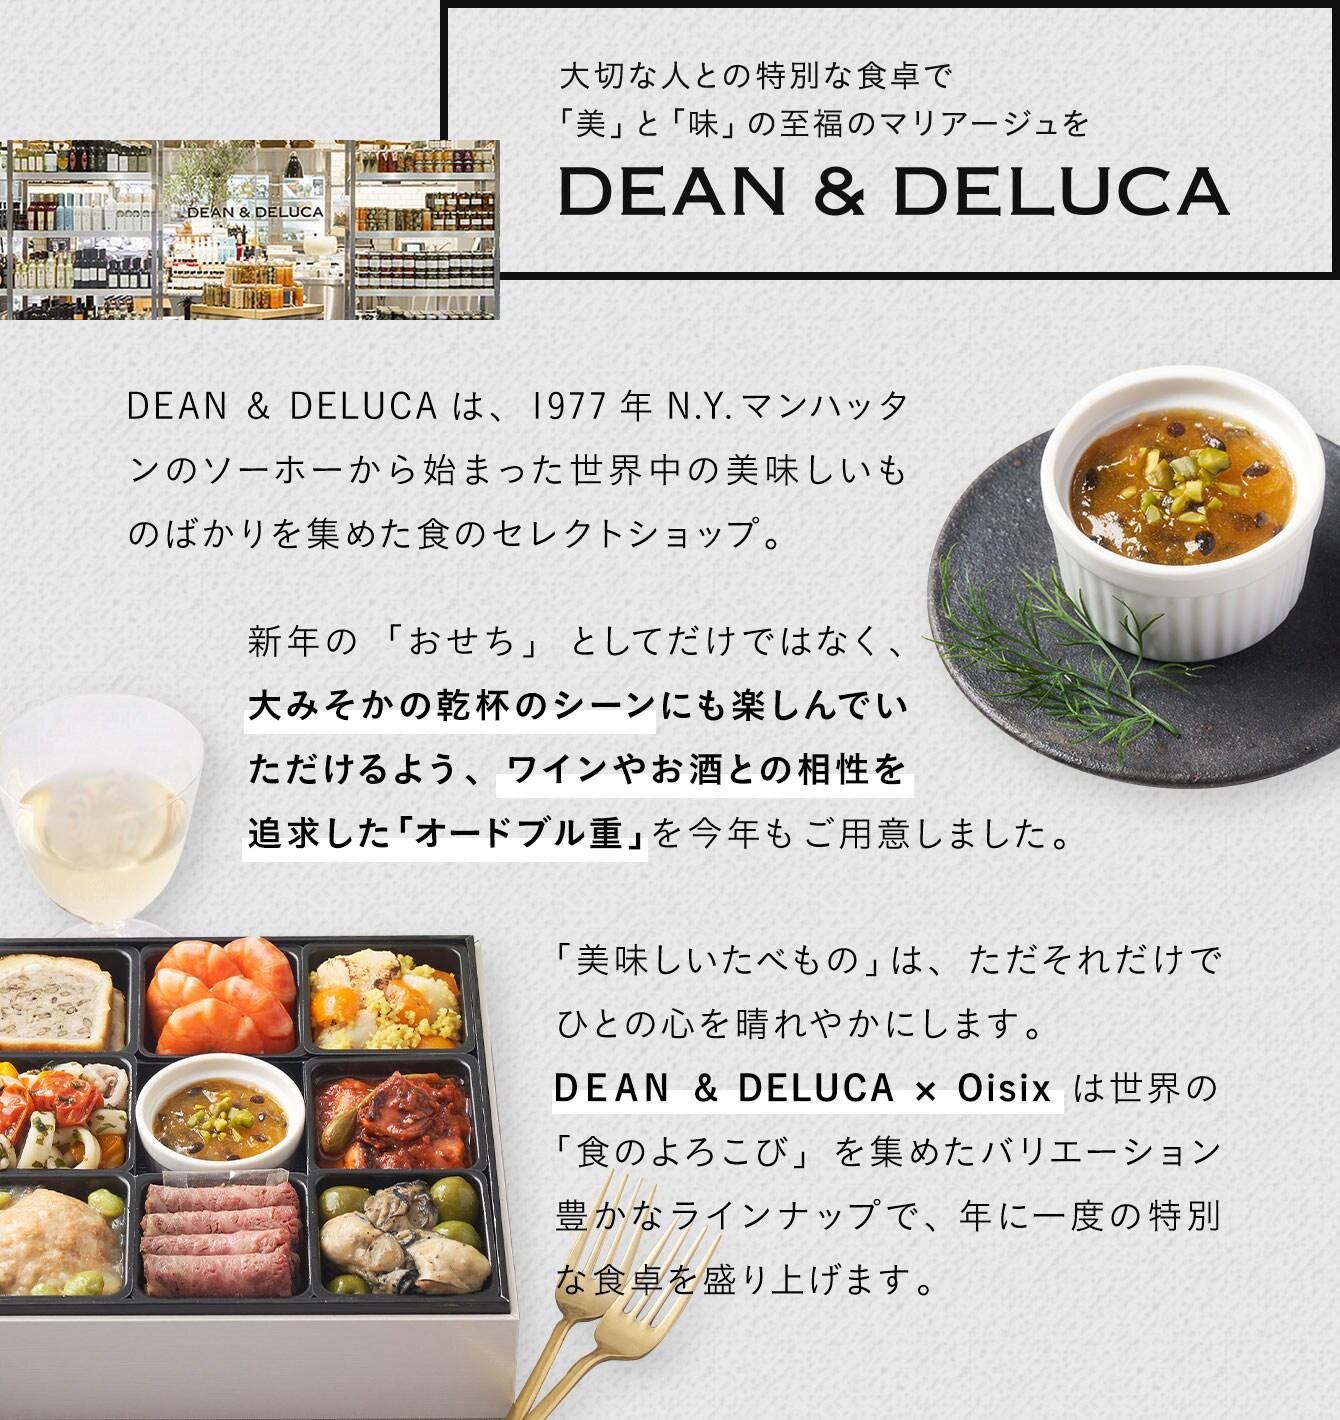 DEAN & DELUCAについて